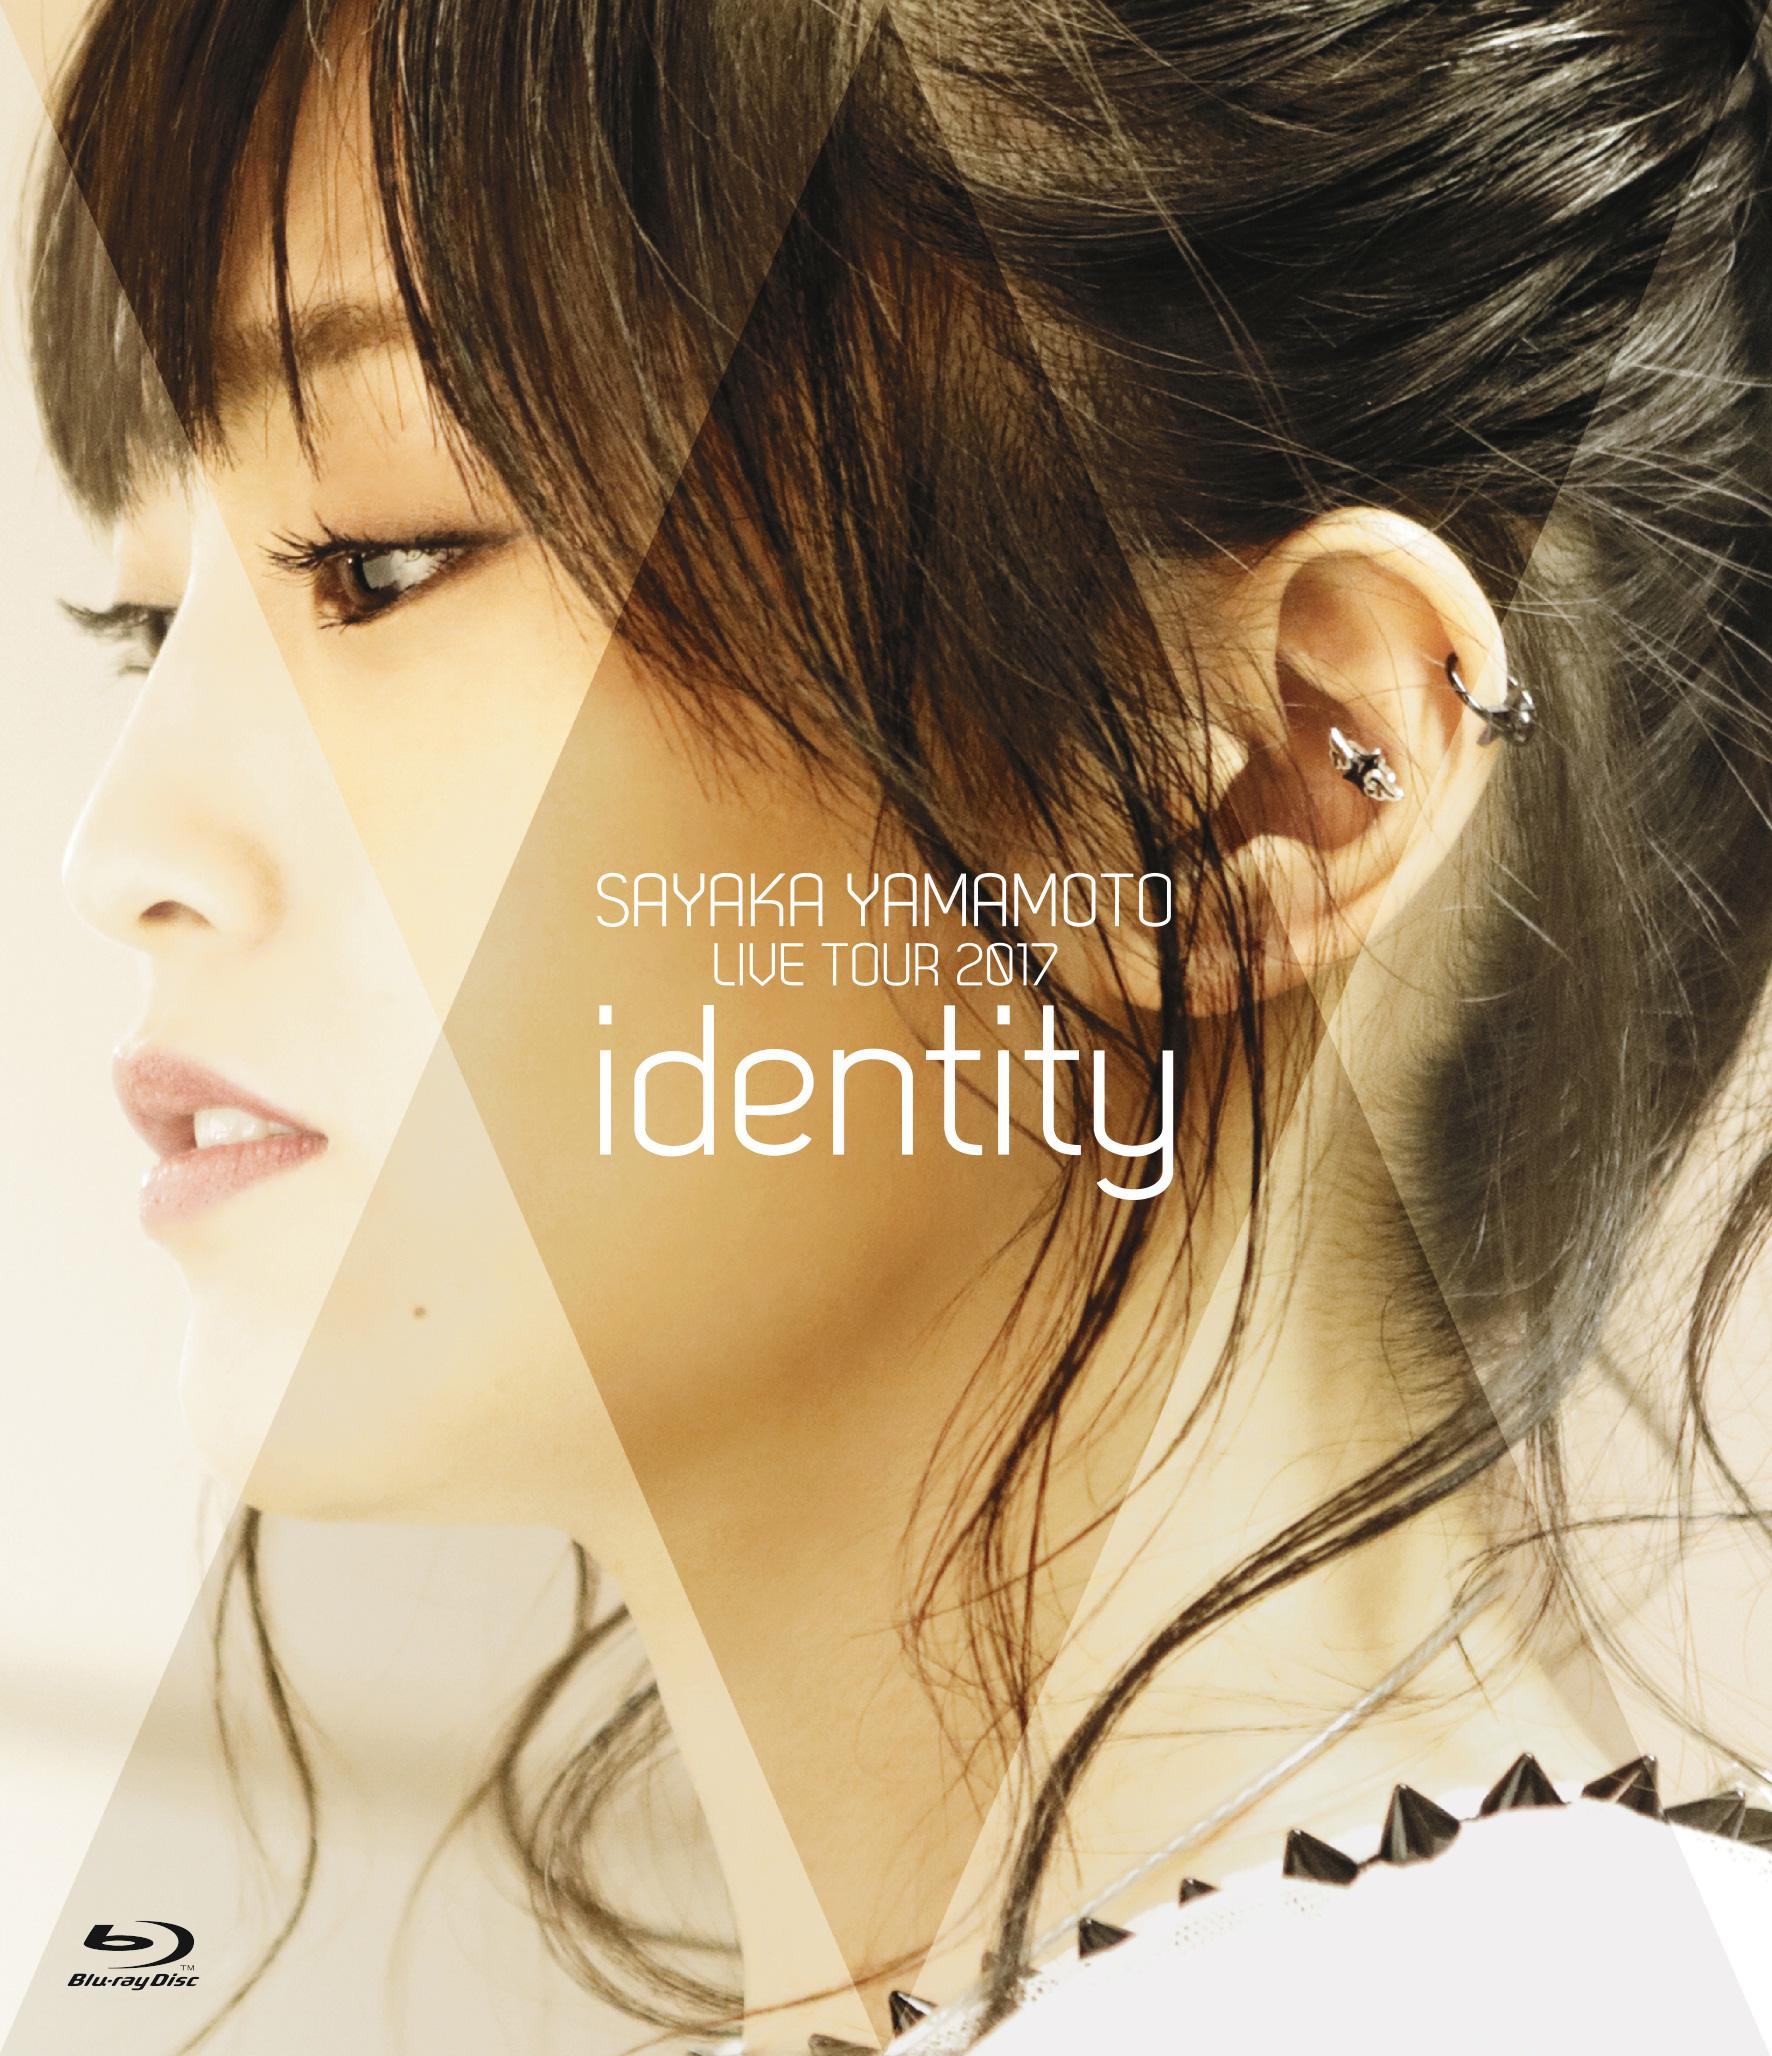 NekoPOP-Sayaka-Yamamoto-Live-Tour-identity-2017-BD-DVD-announce1